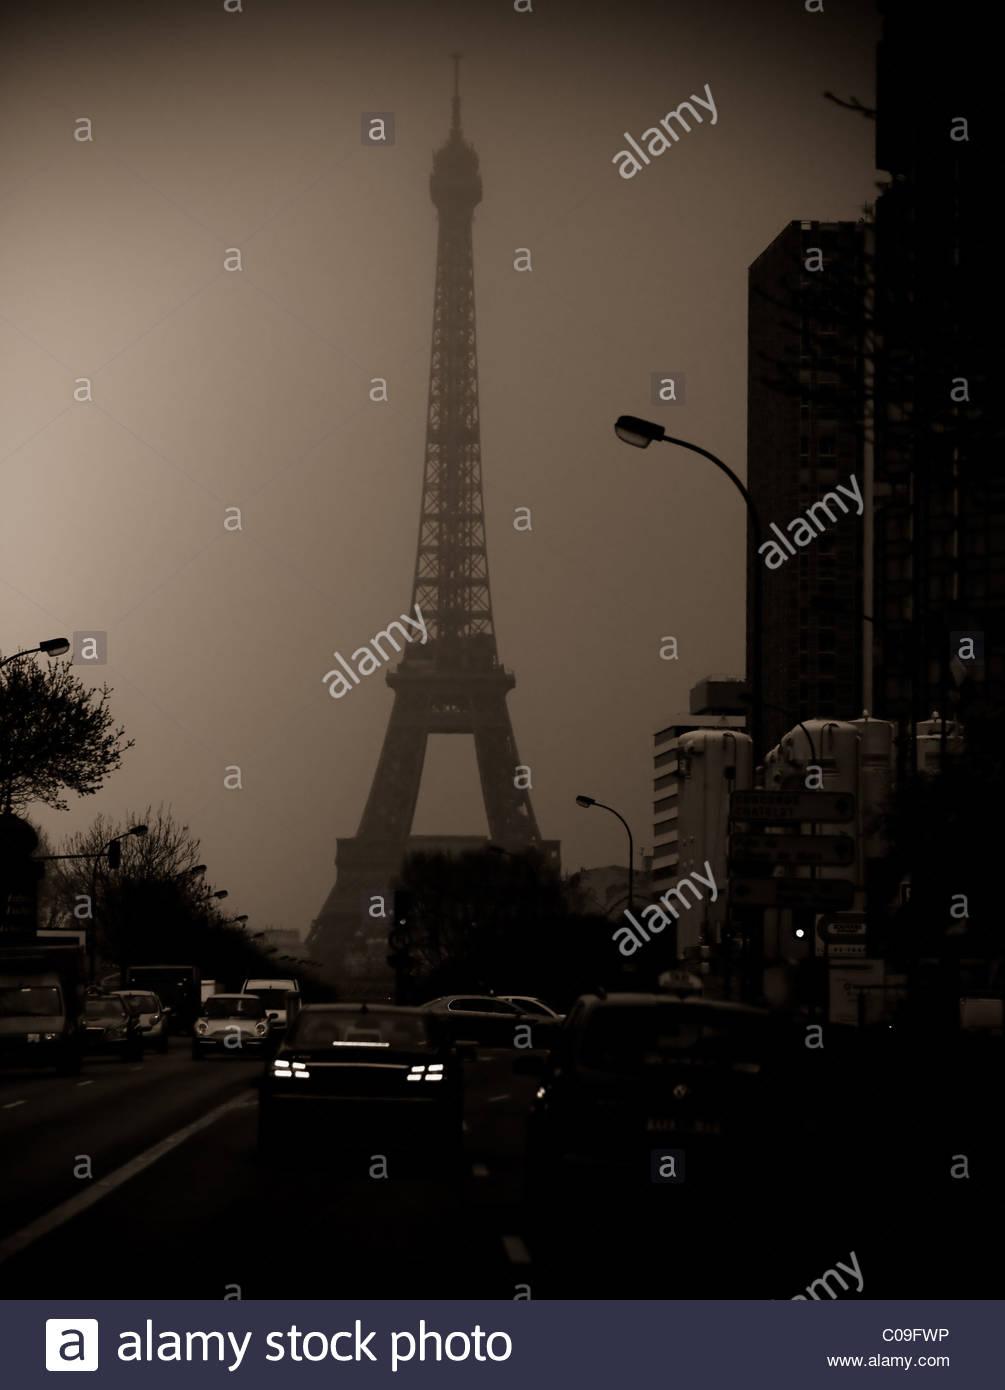 Street scene Paris France - night evening dark fog mist foggy - Stock Image